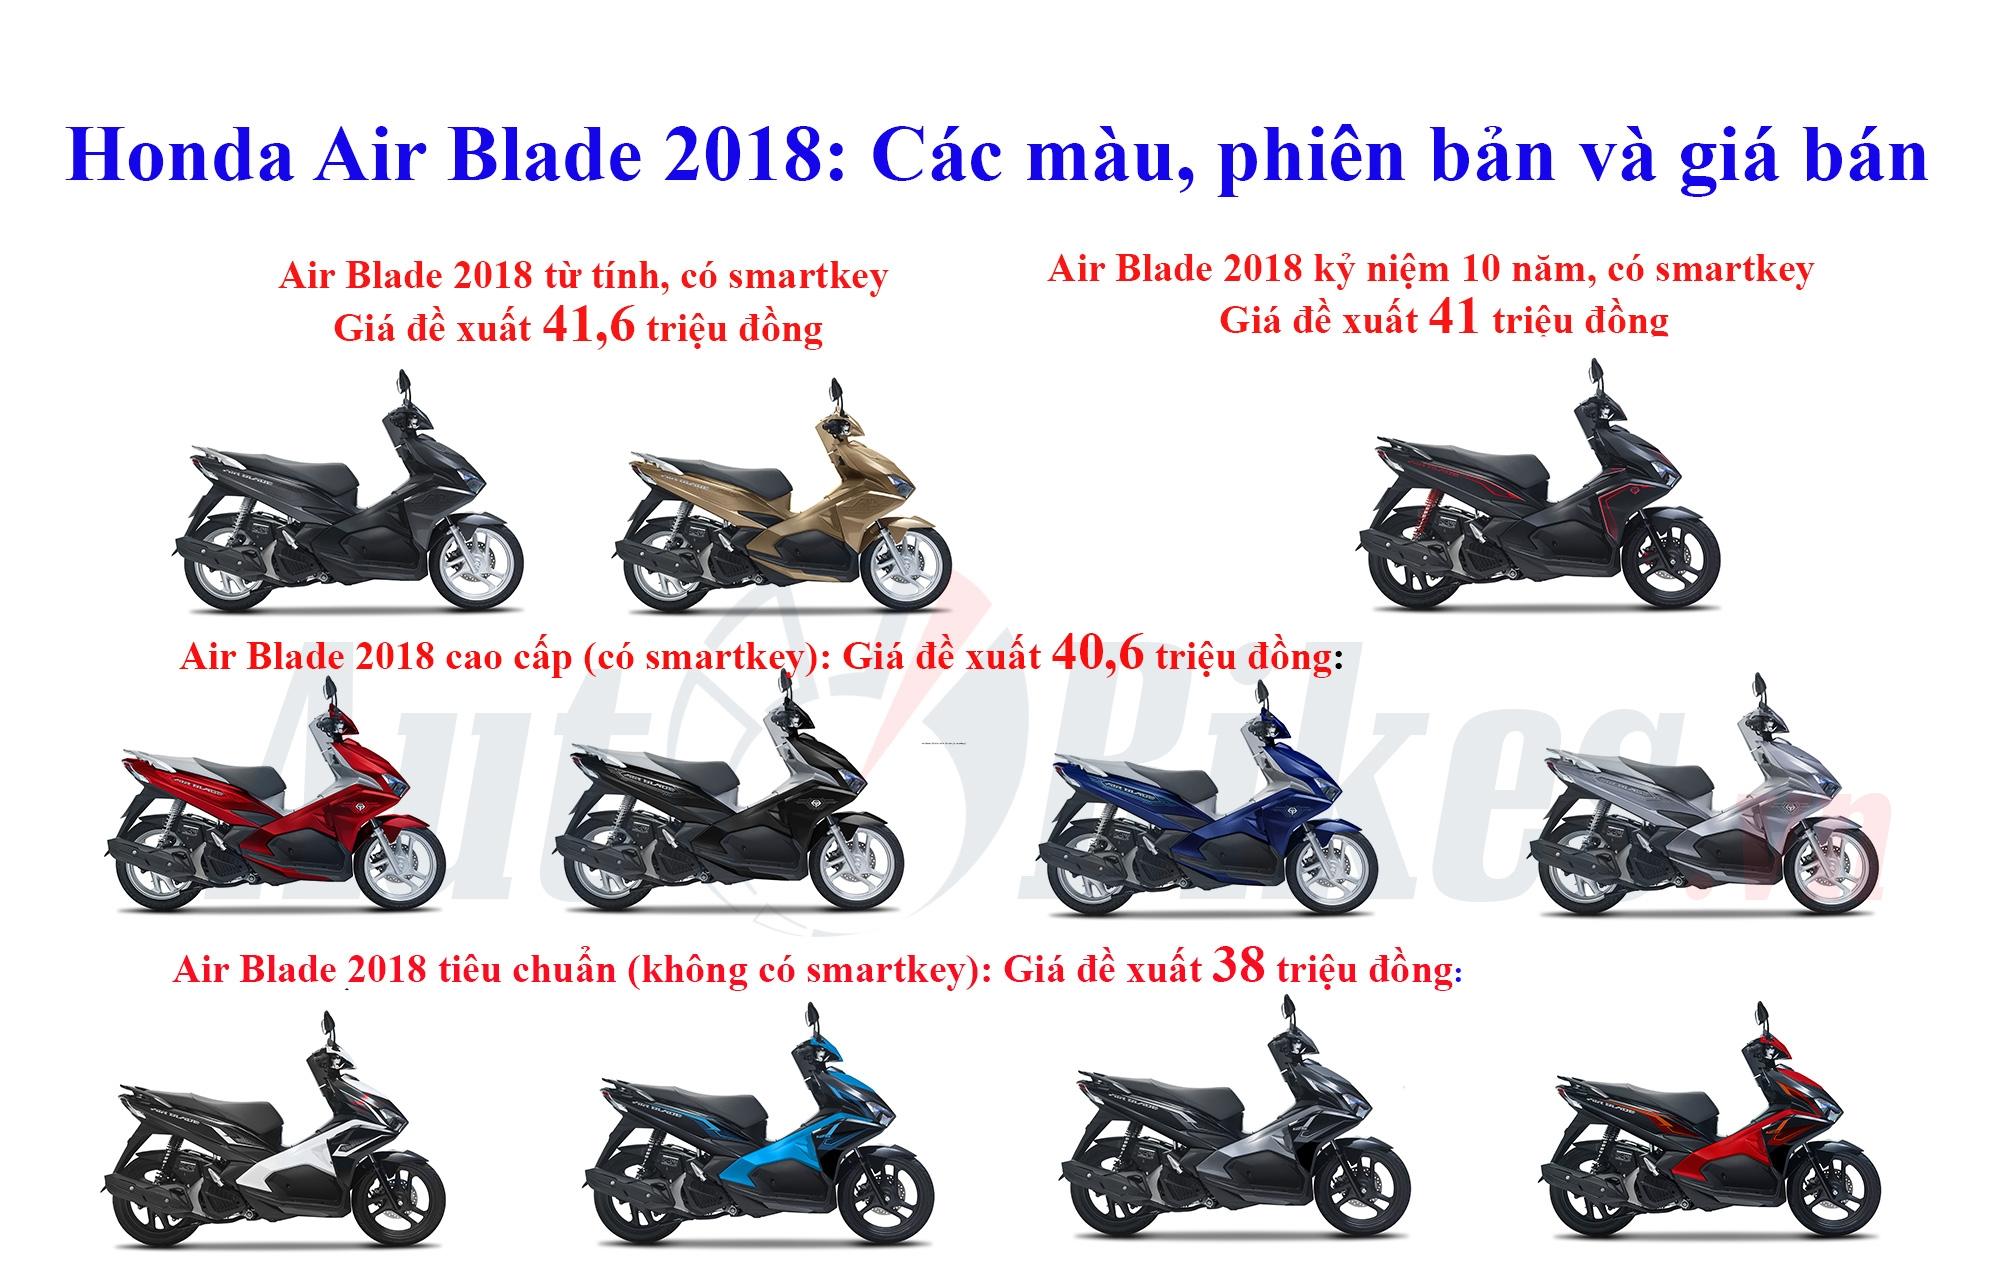 chi tiet 4 phien ban honda air blade 2018